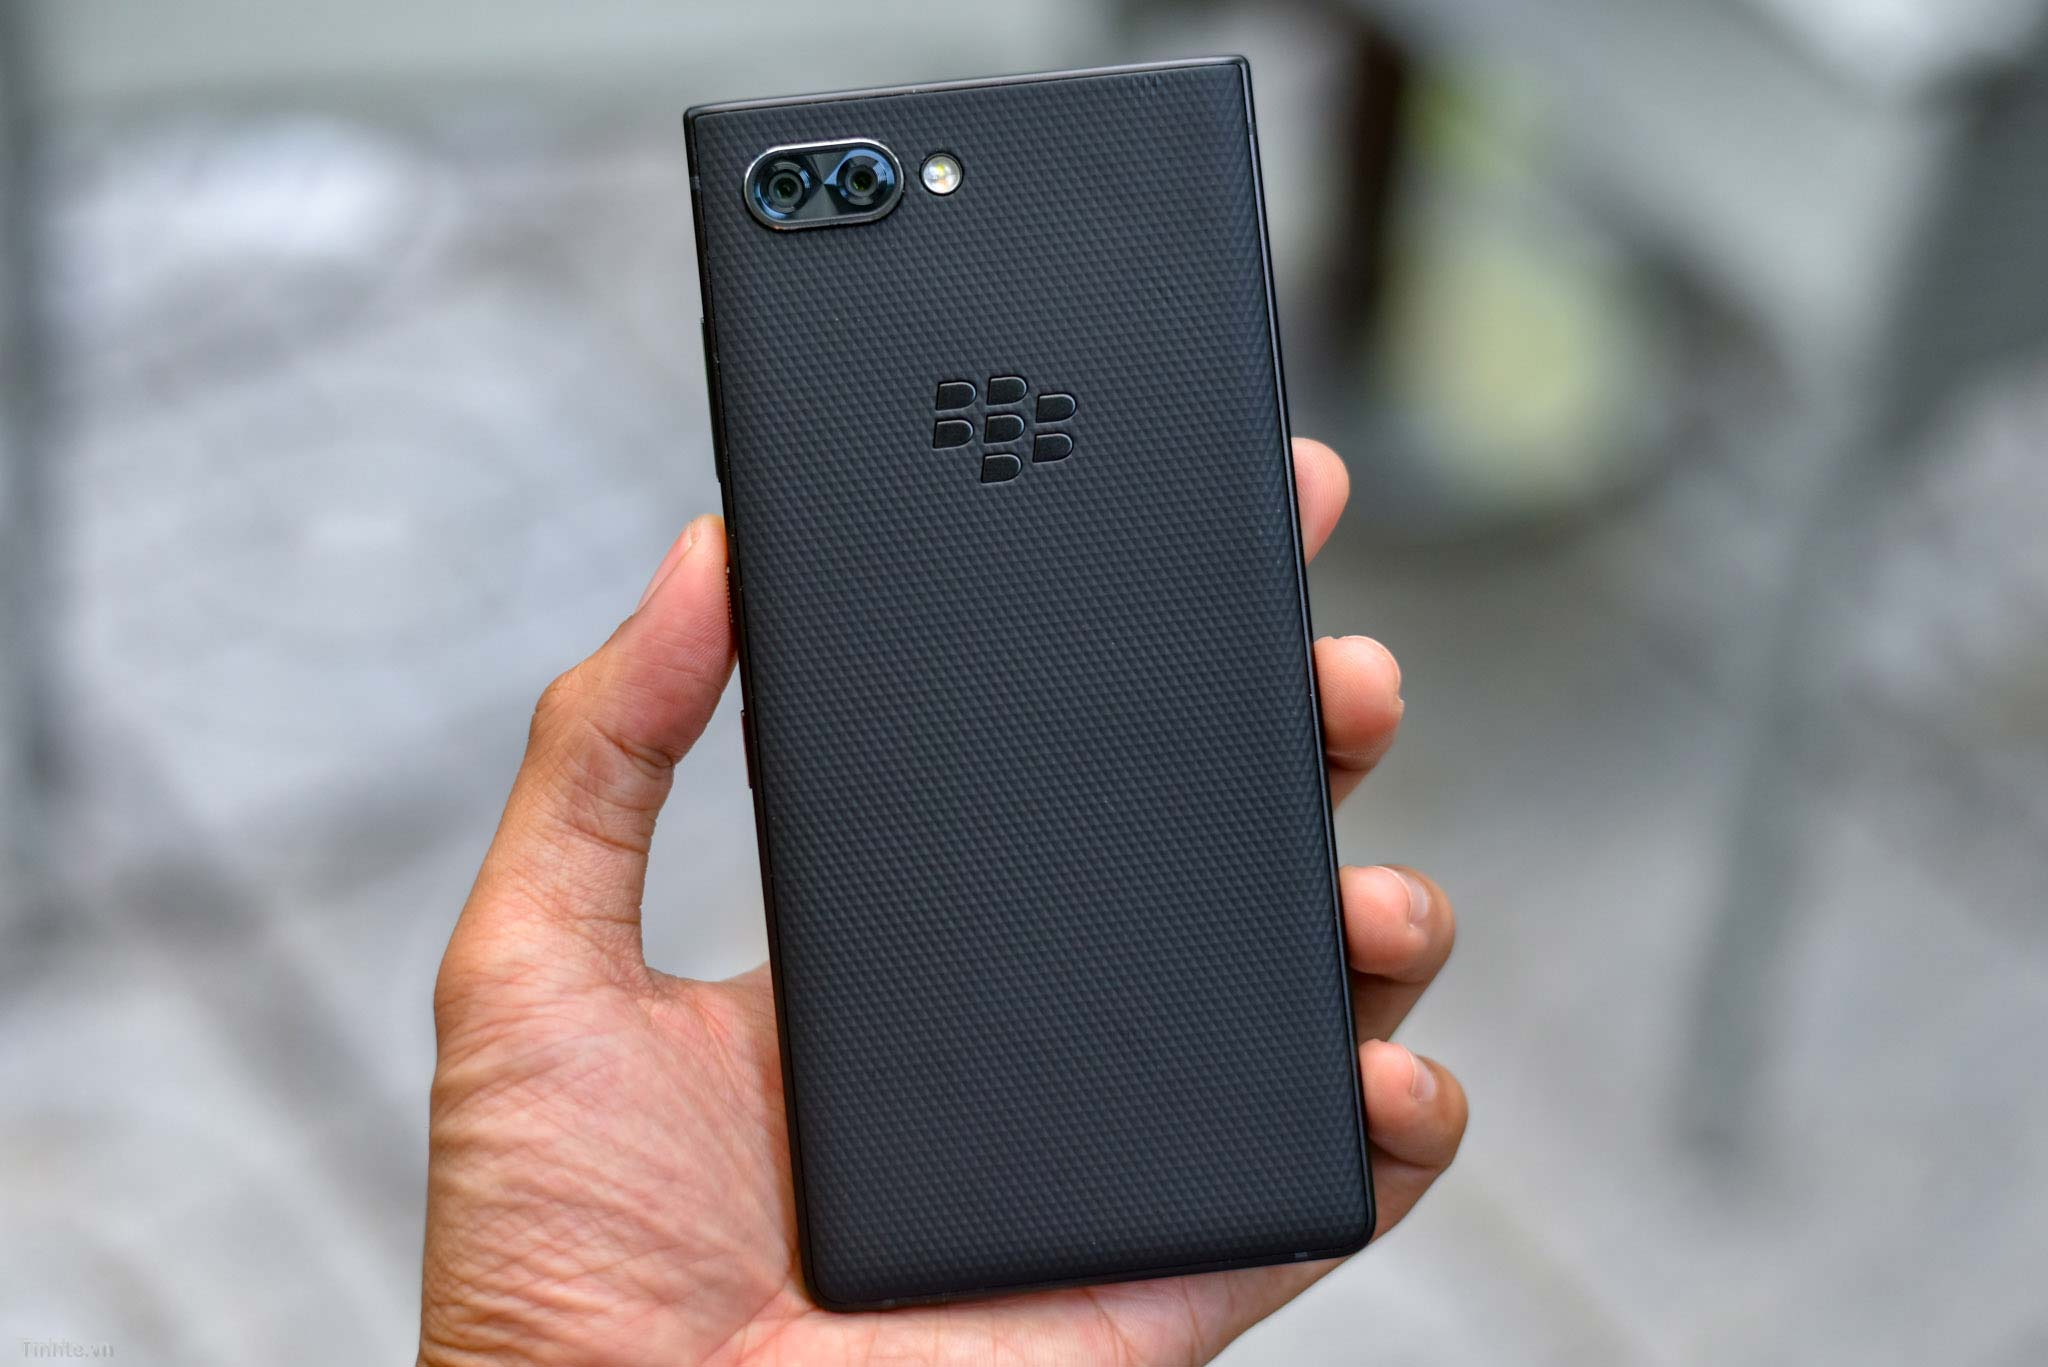 4338248_BlackBerry_KEY2_mo-hop_tinhte_4.jpg